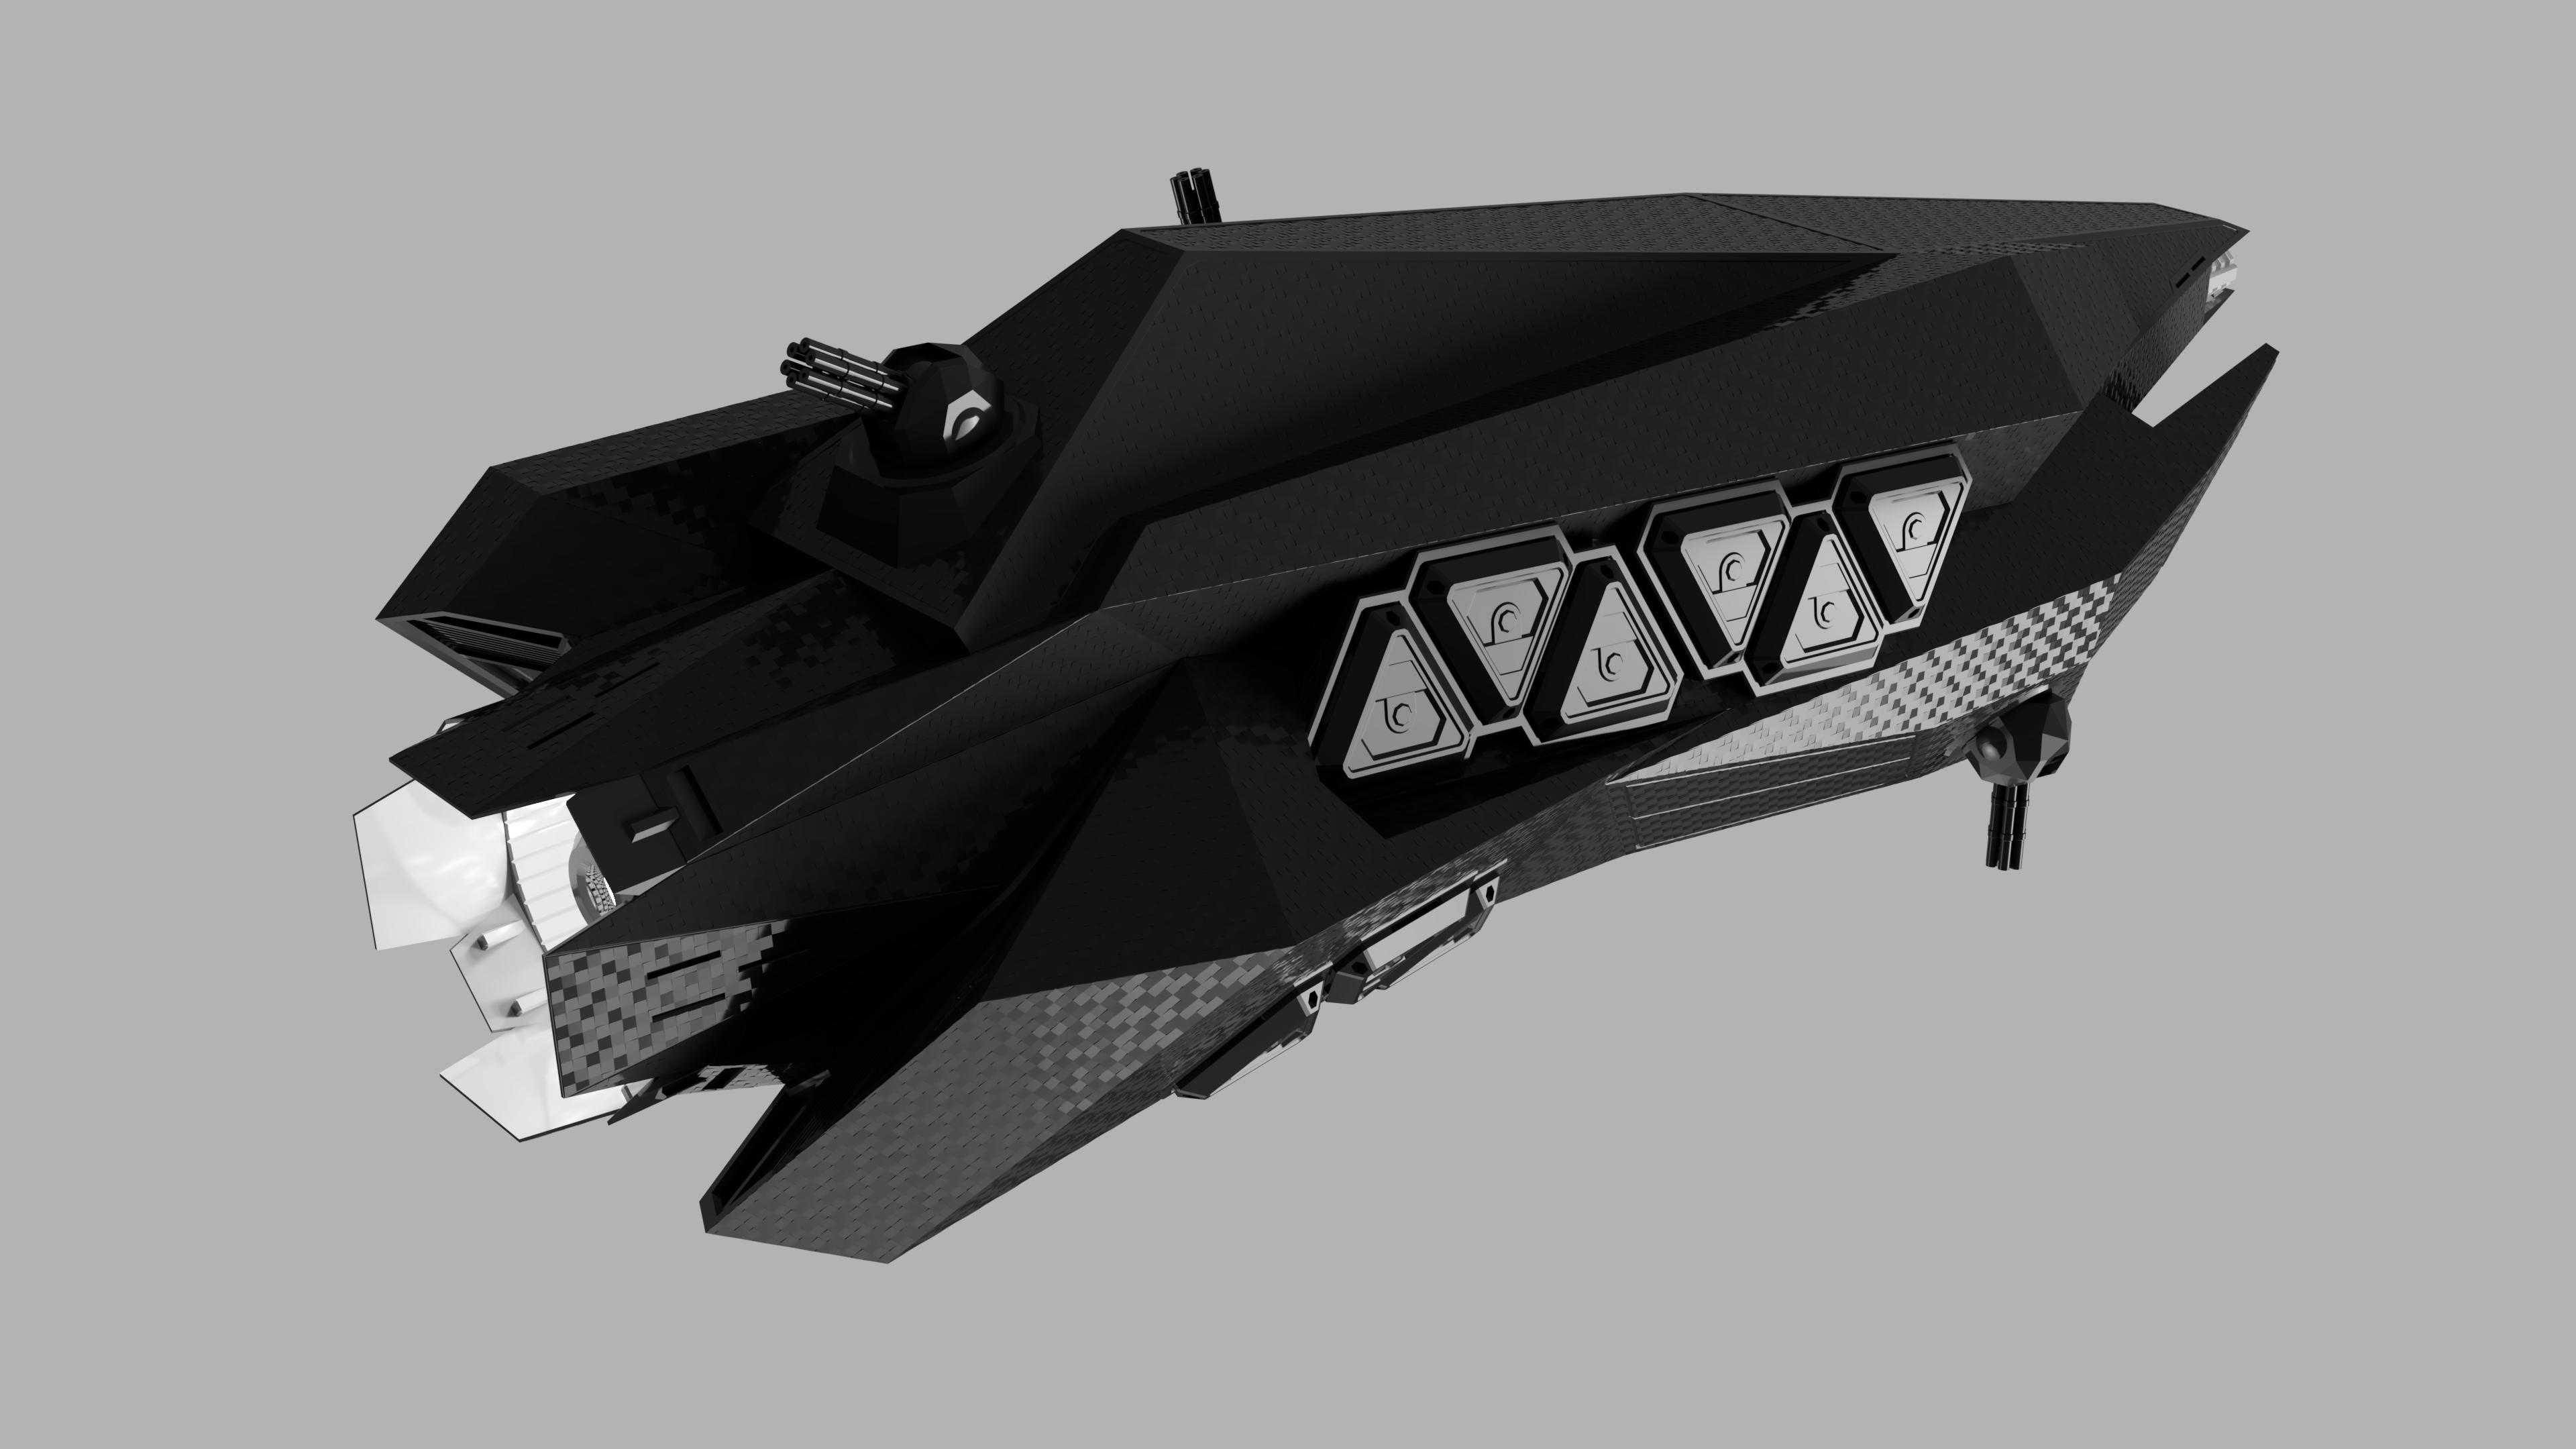 Anubis_2020-Nov-21_06-24-14PM-000_CustomizedView7242683060.png Download STL file Anubis • 3D print template, sergusy